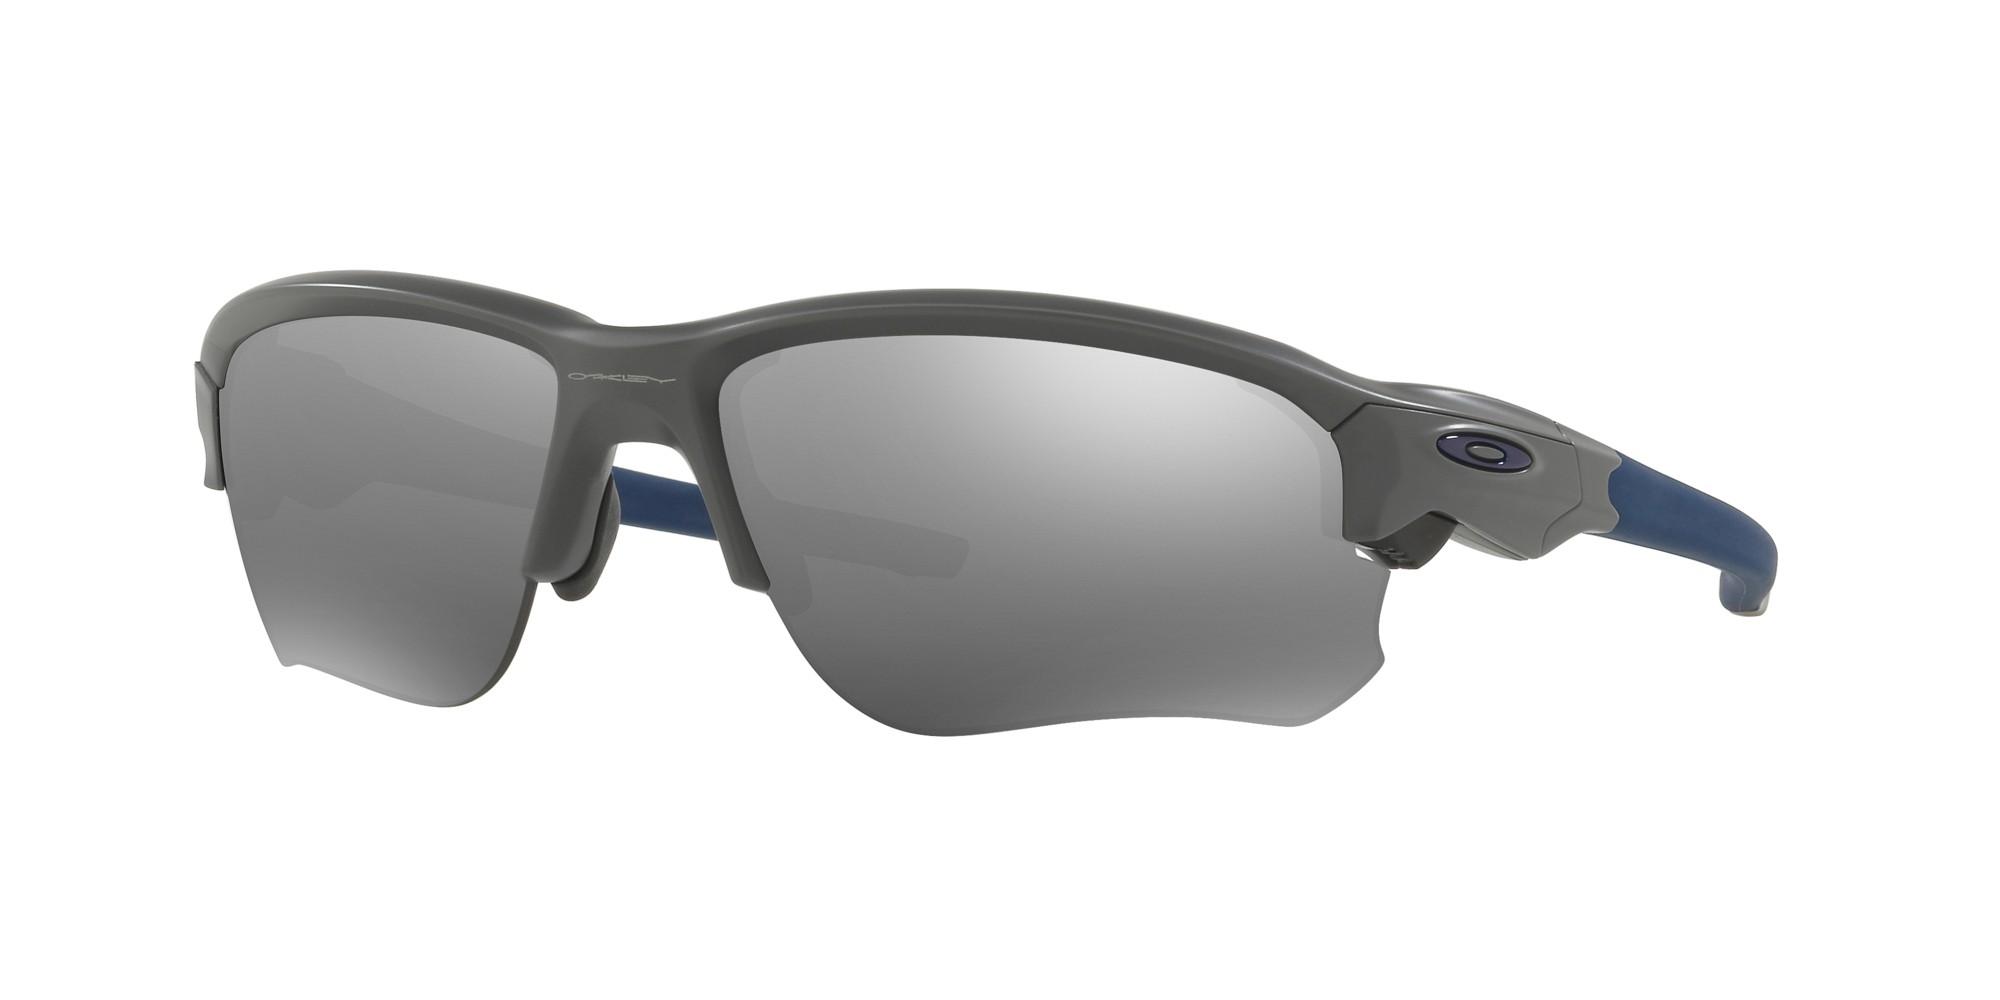 842a65ebc25c Authentic Oakley Flak Draft Prescription Sunglasses